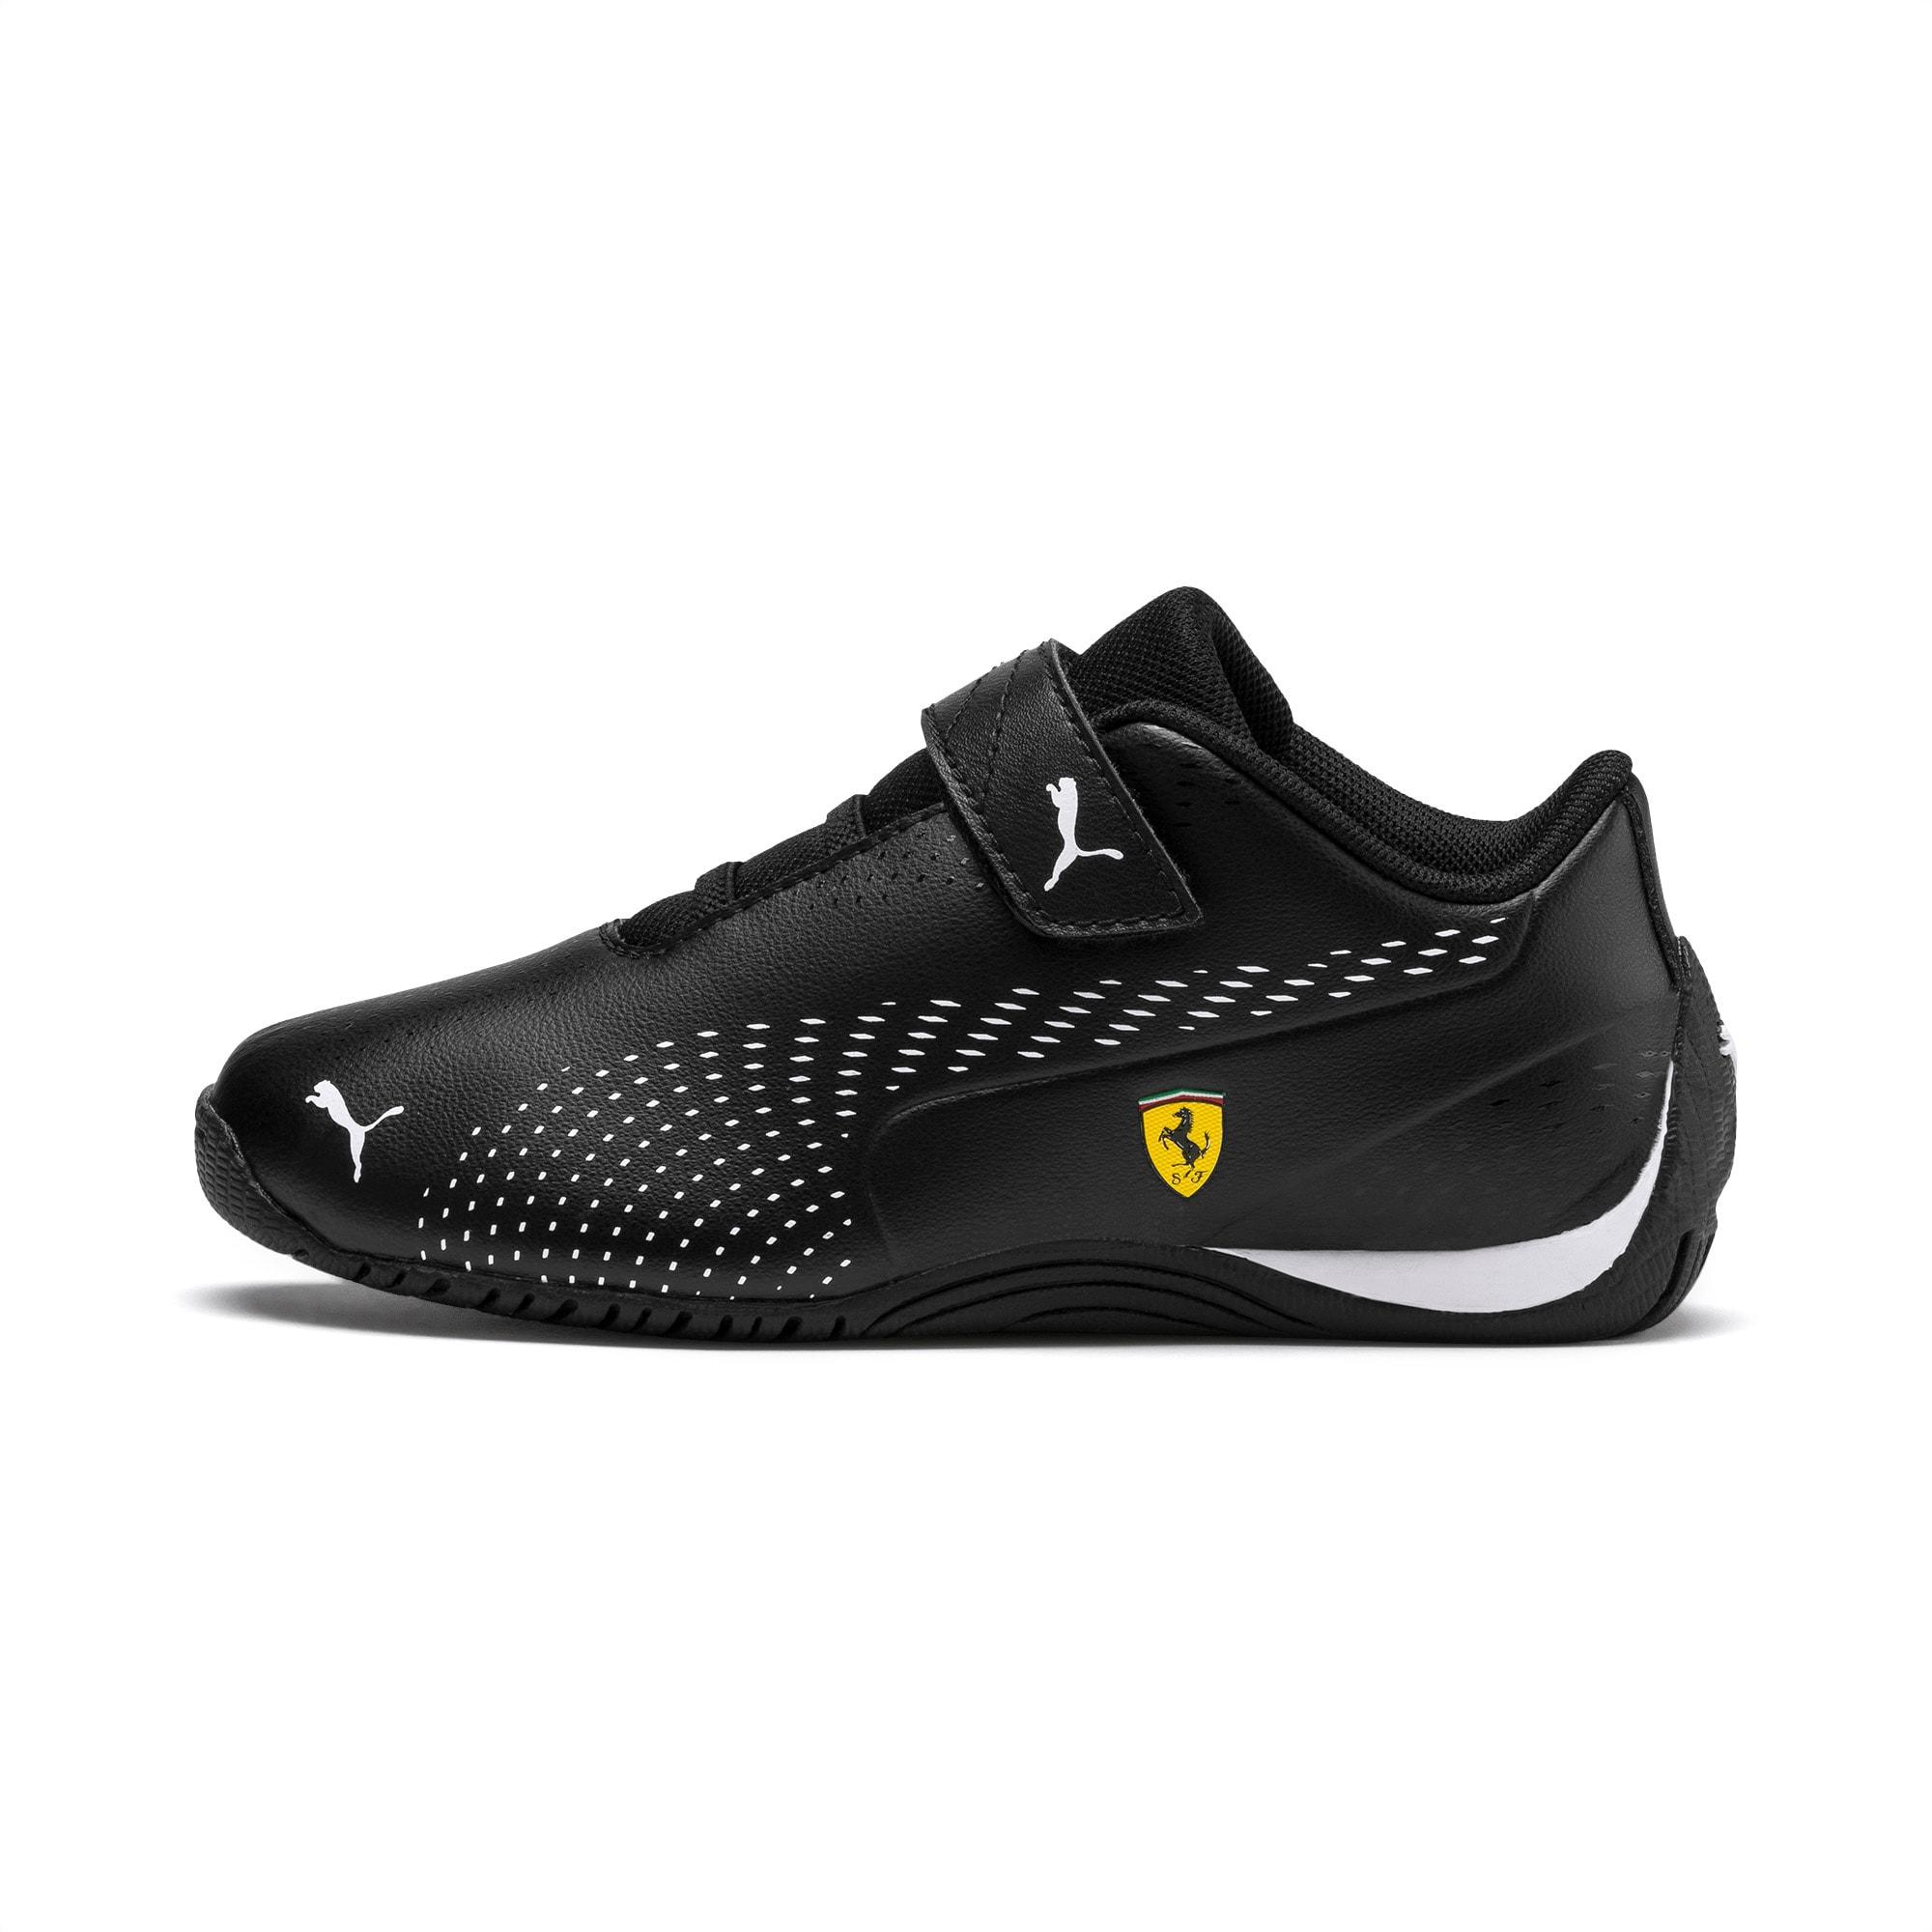 puma ferrari shoes price in india